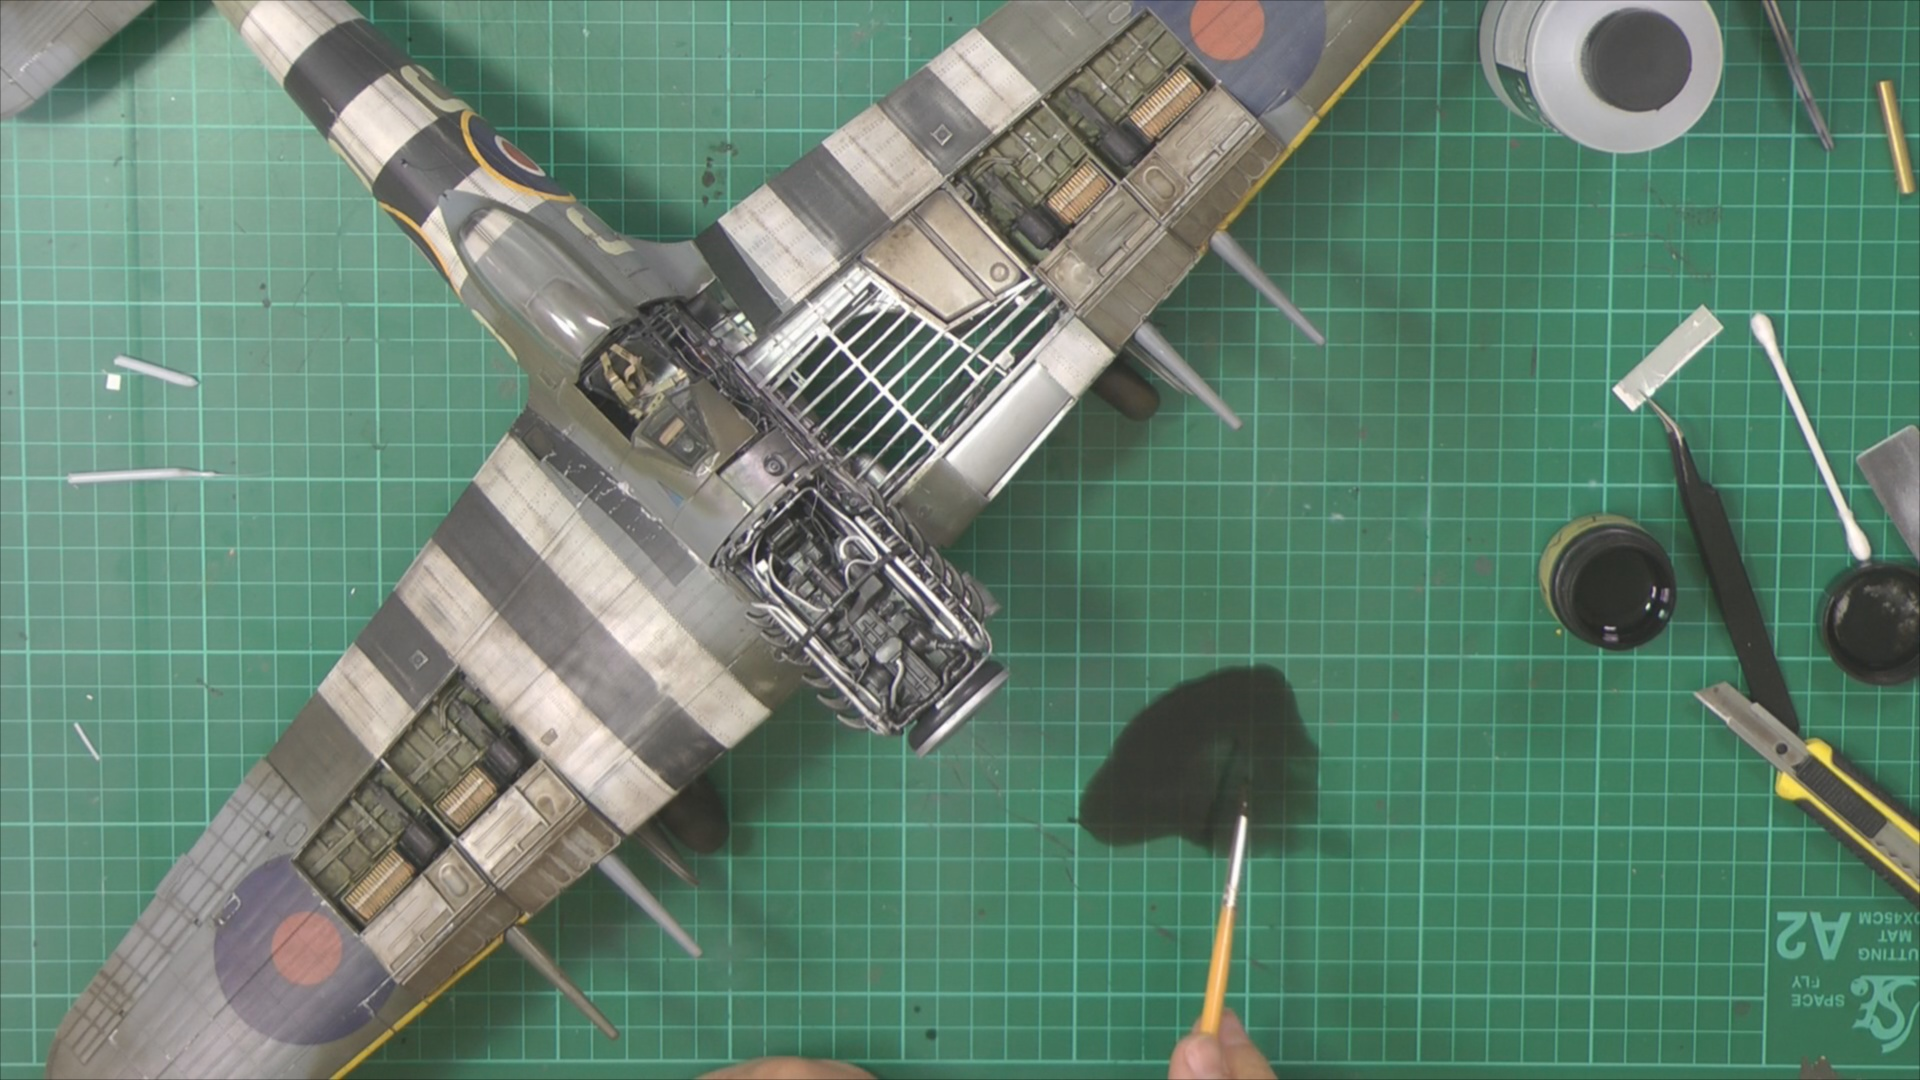 Hawker+Typhoon+Part+14+Pic+2.jpg